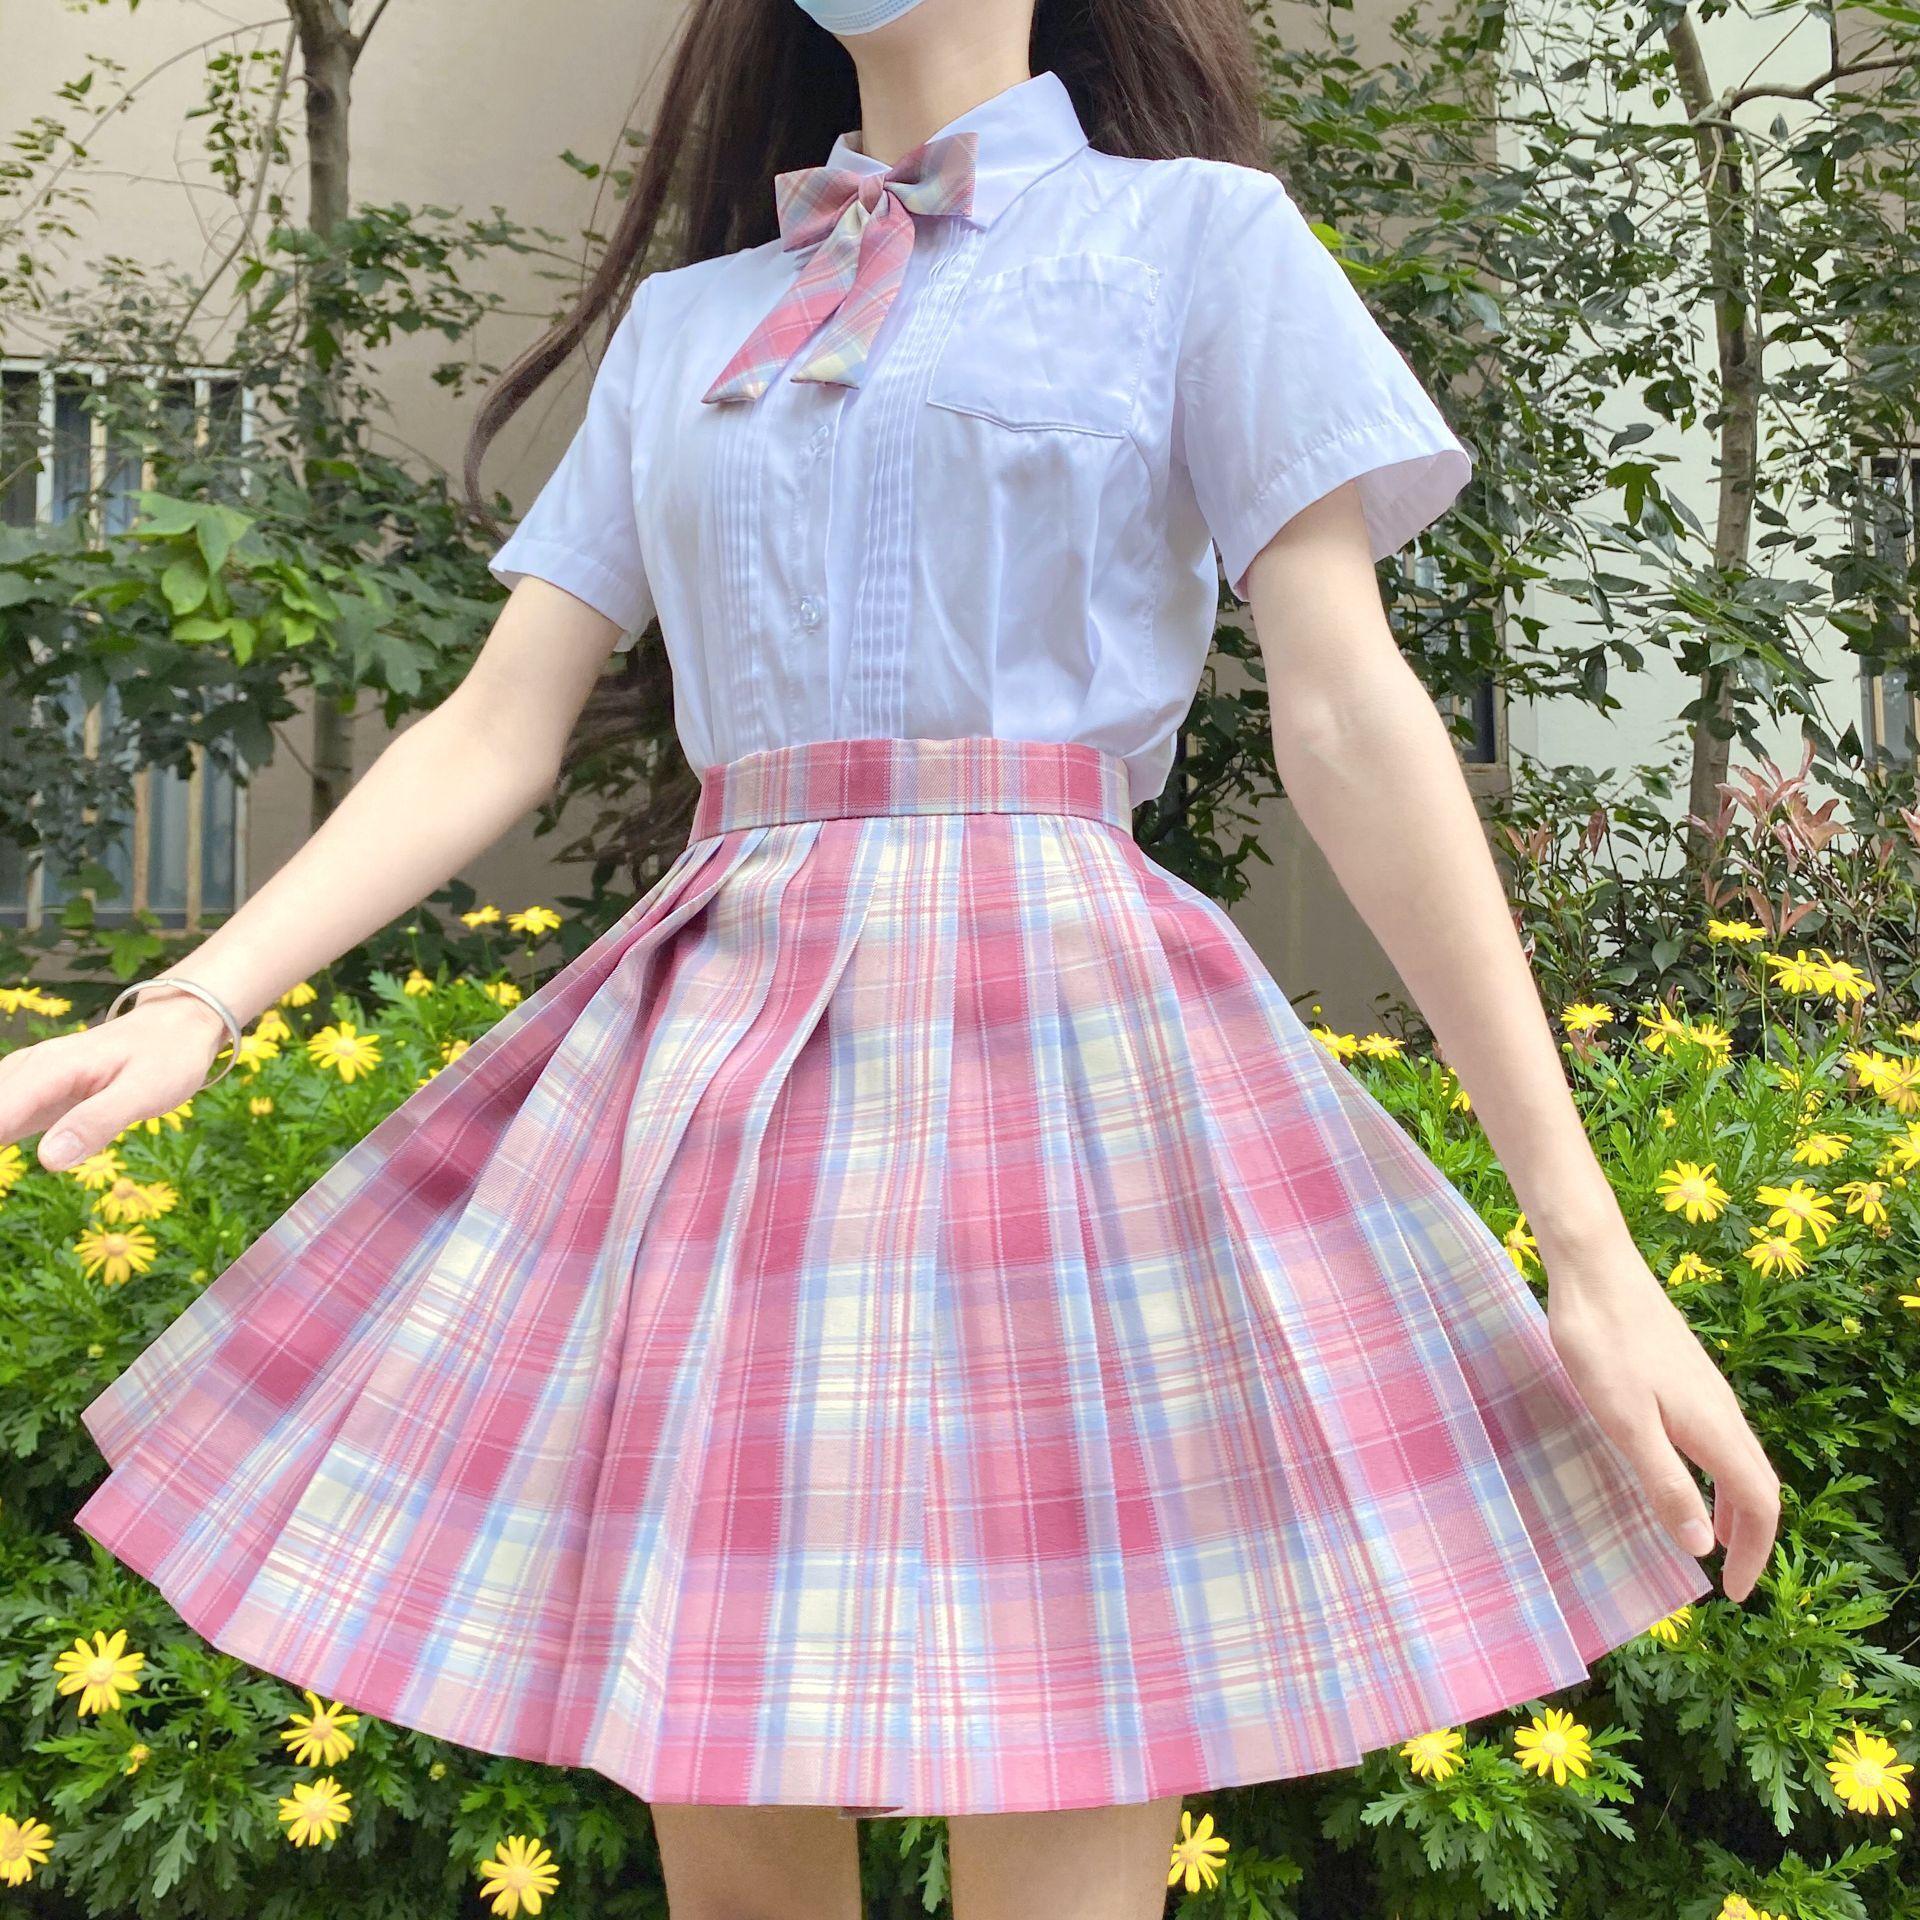 school uniform outfit white short sleeve top and pink skirt School Dresses Jk Uniform Sets Girls White Shirt Pink Skirt Tie Short-sleeve Navy Sailor Suit Anime Form High School Uniform XL